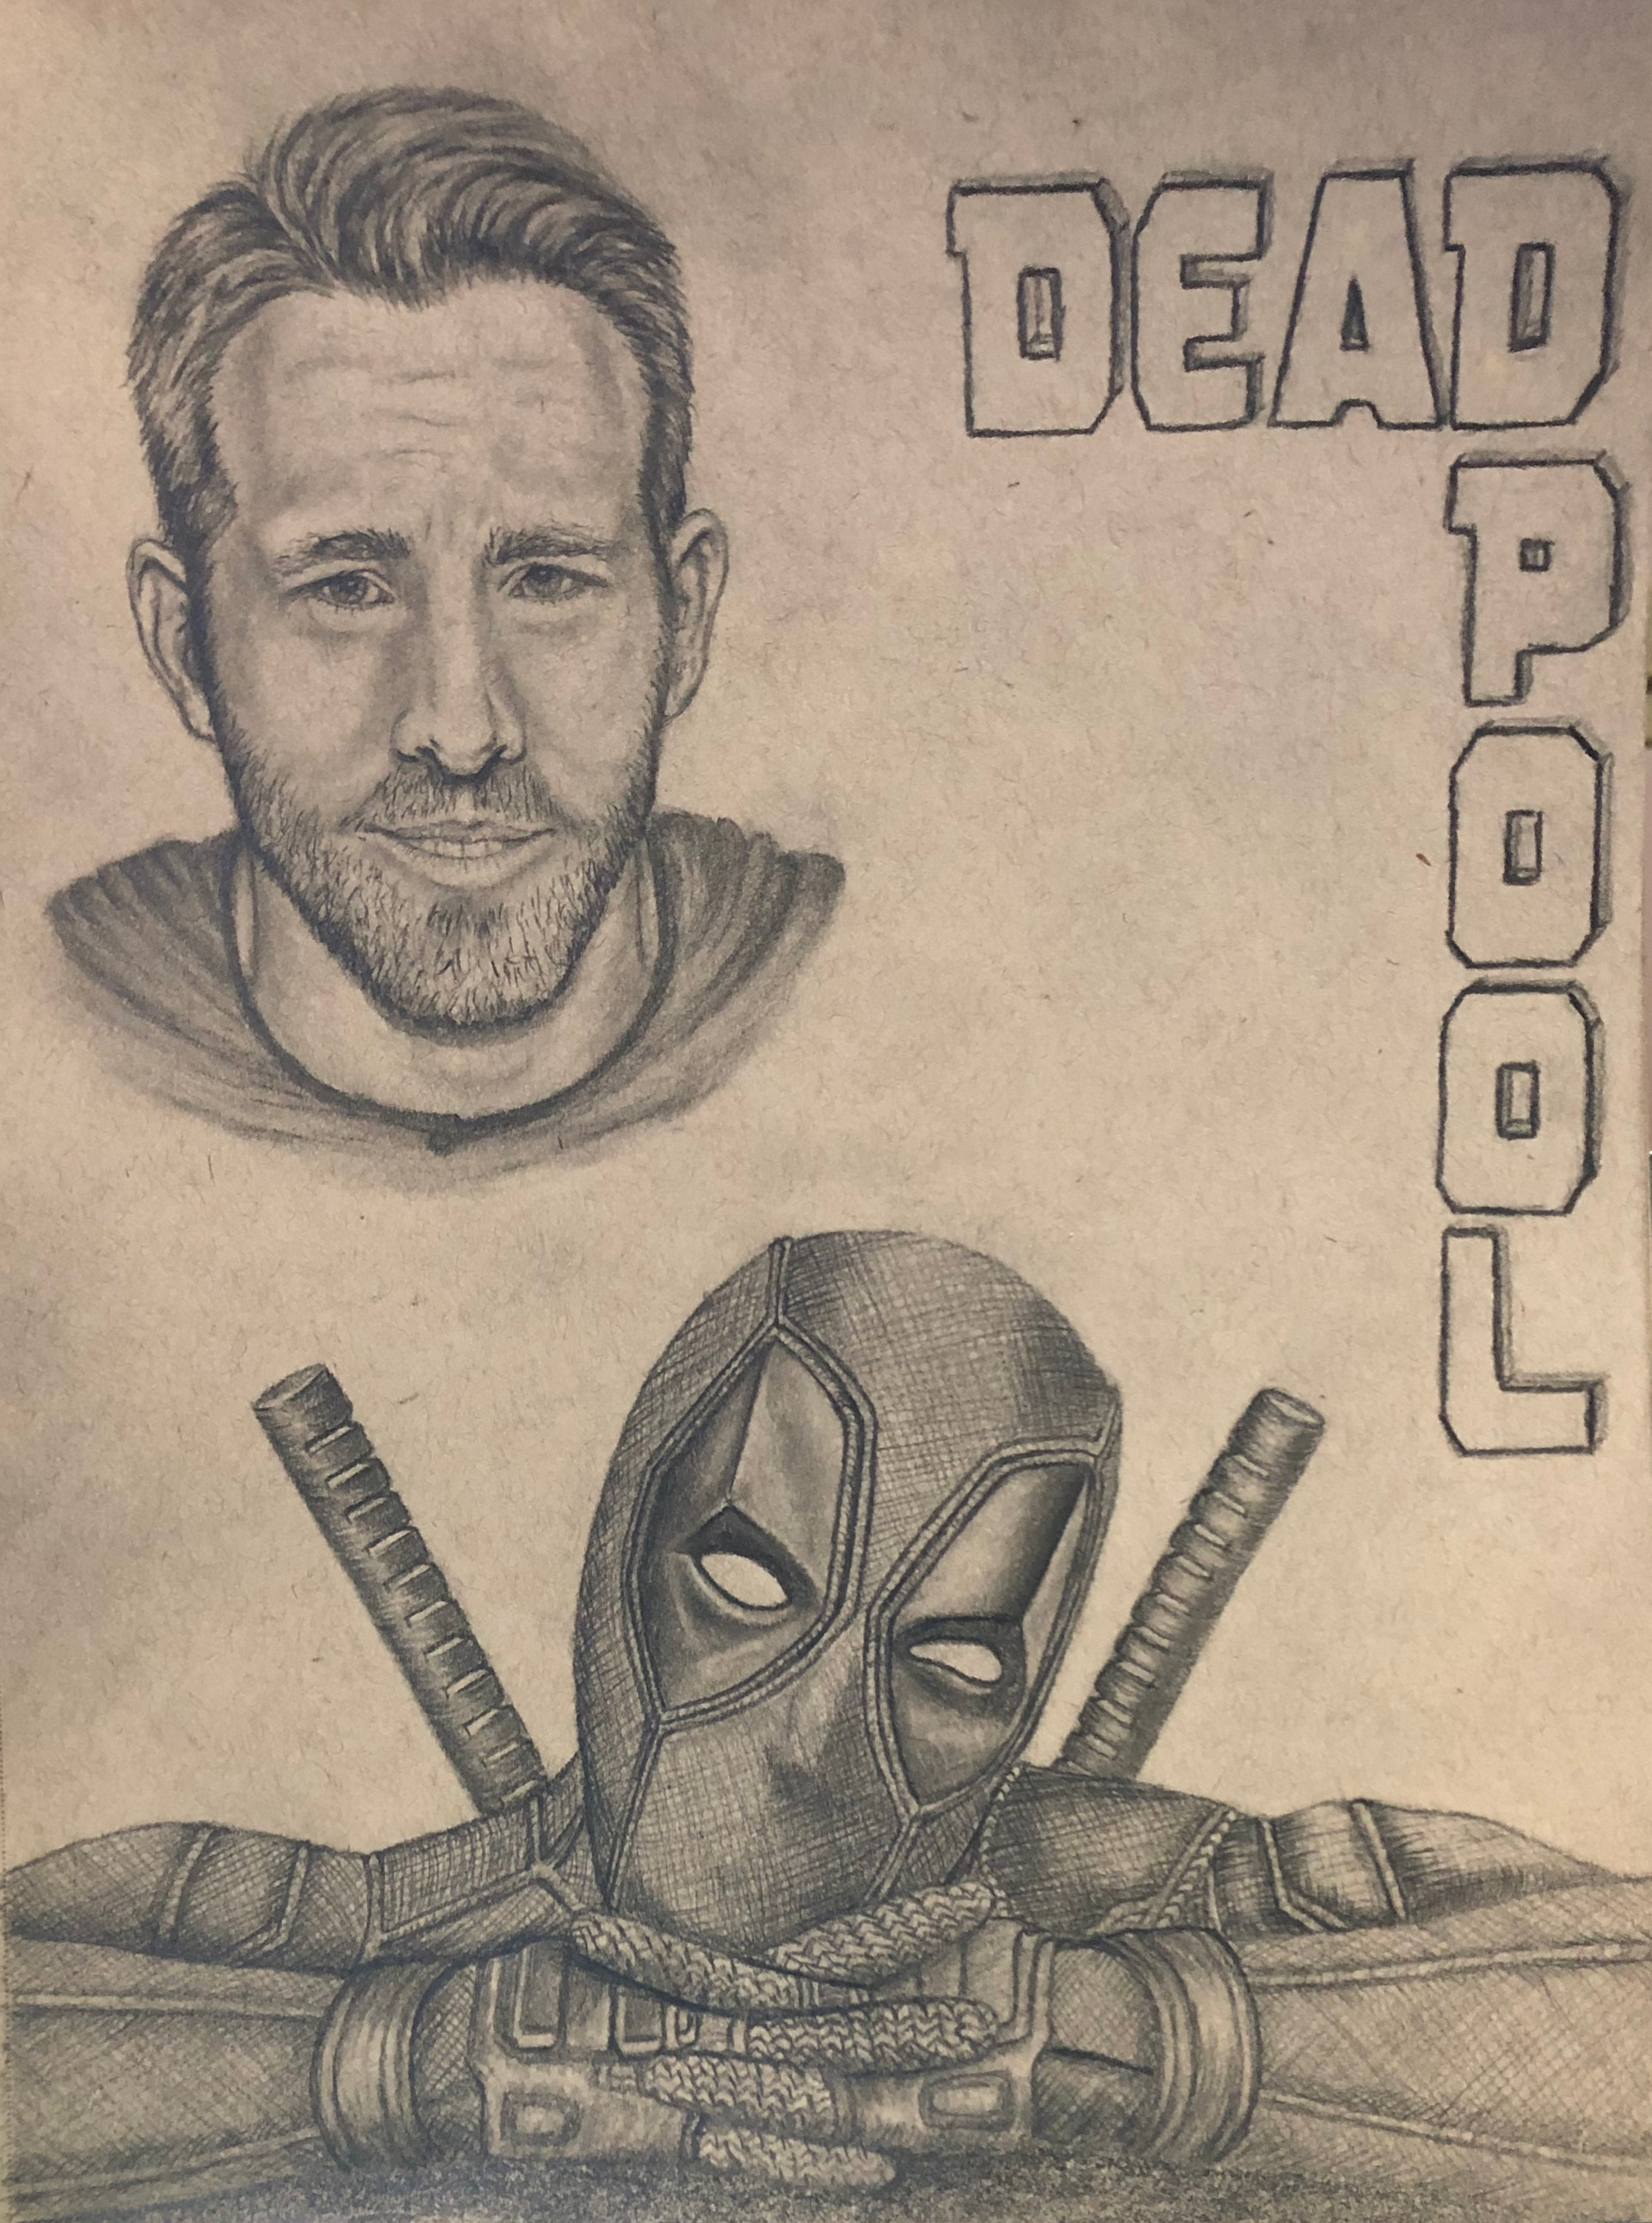 Deadpool / Ryan Reynolds